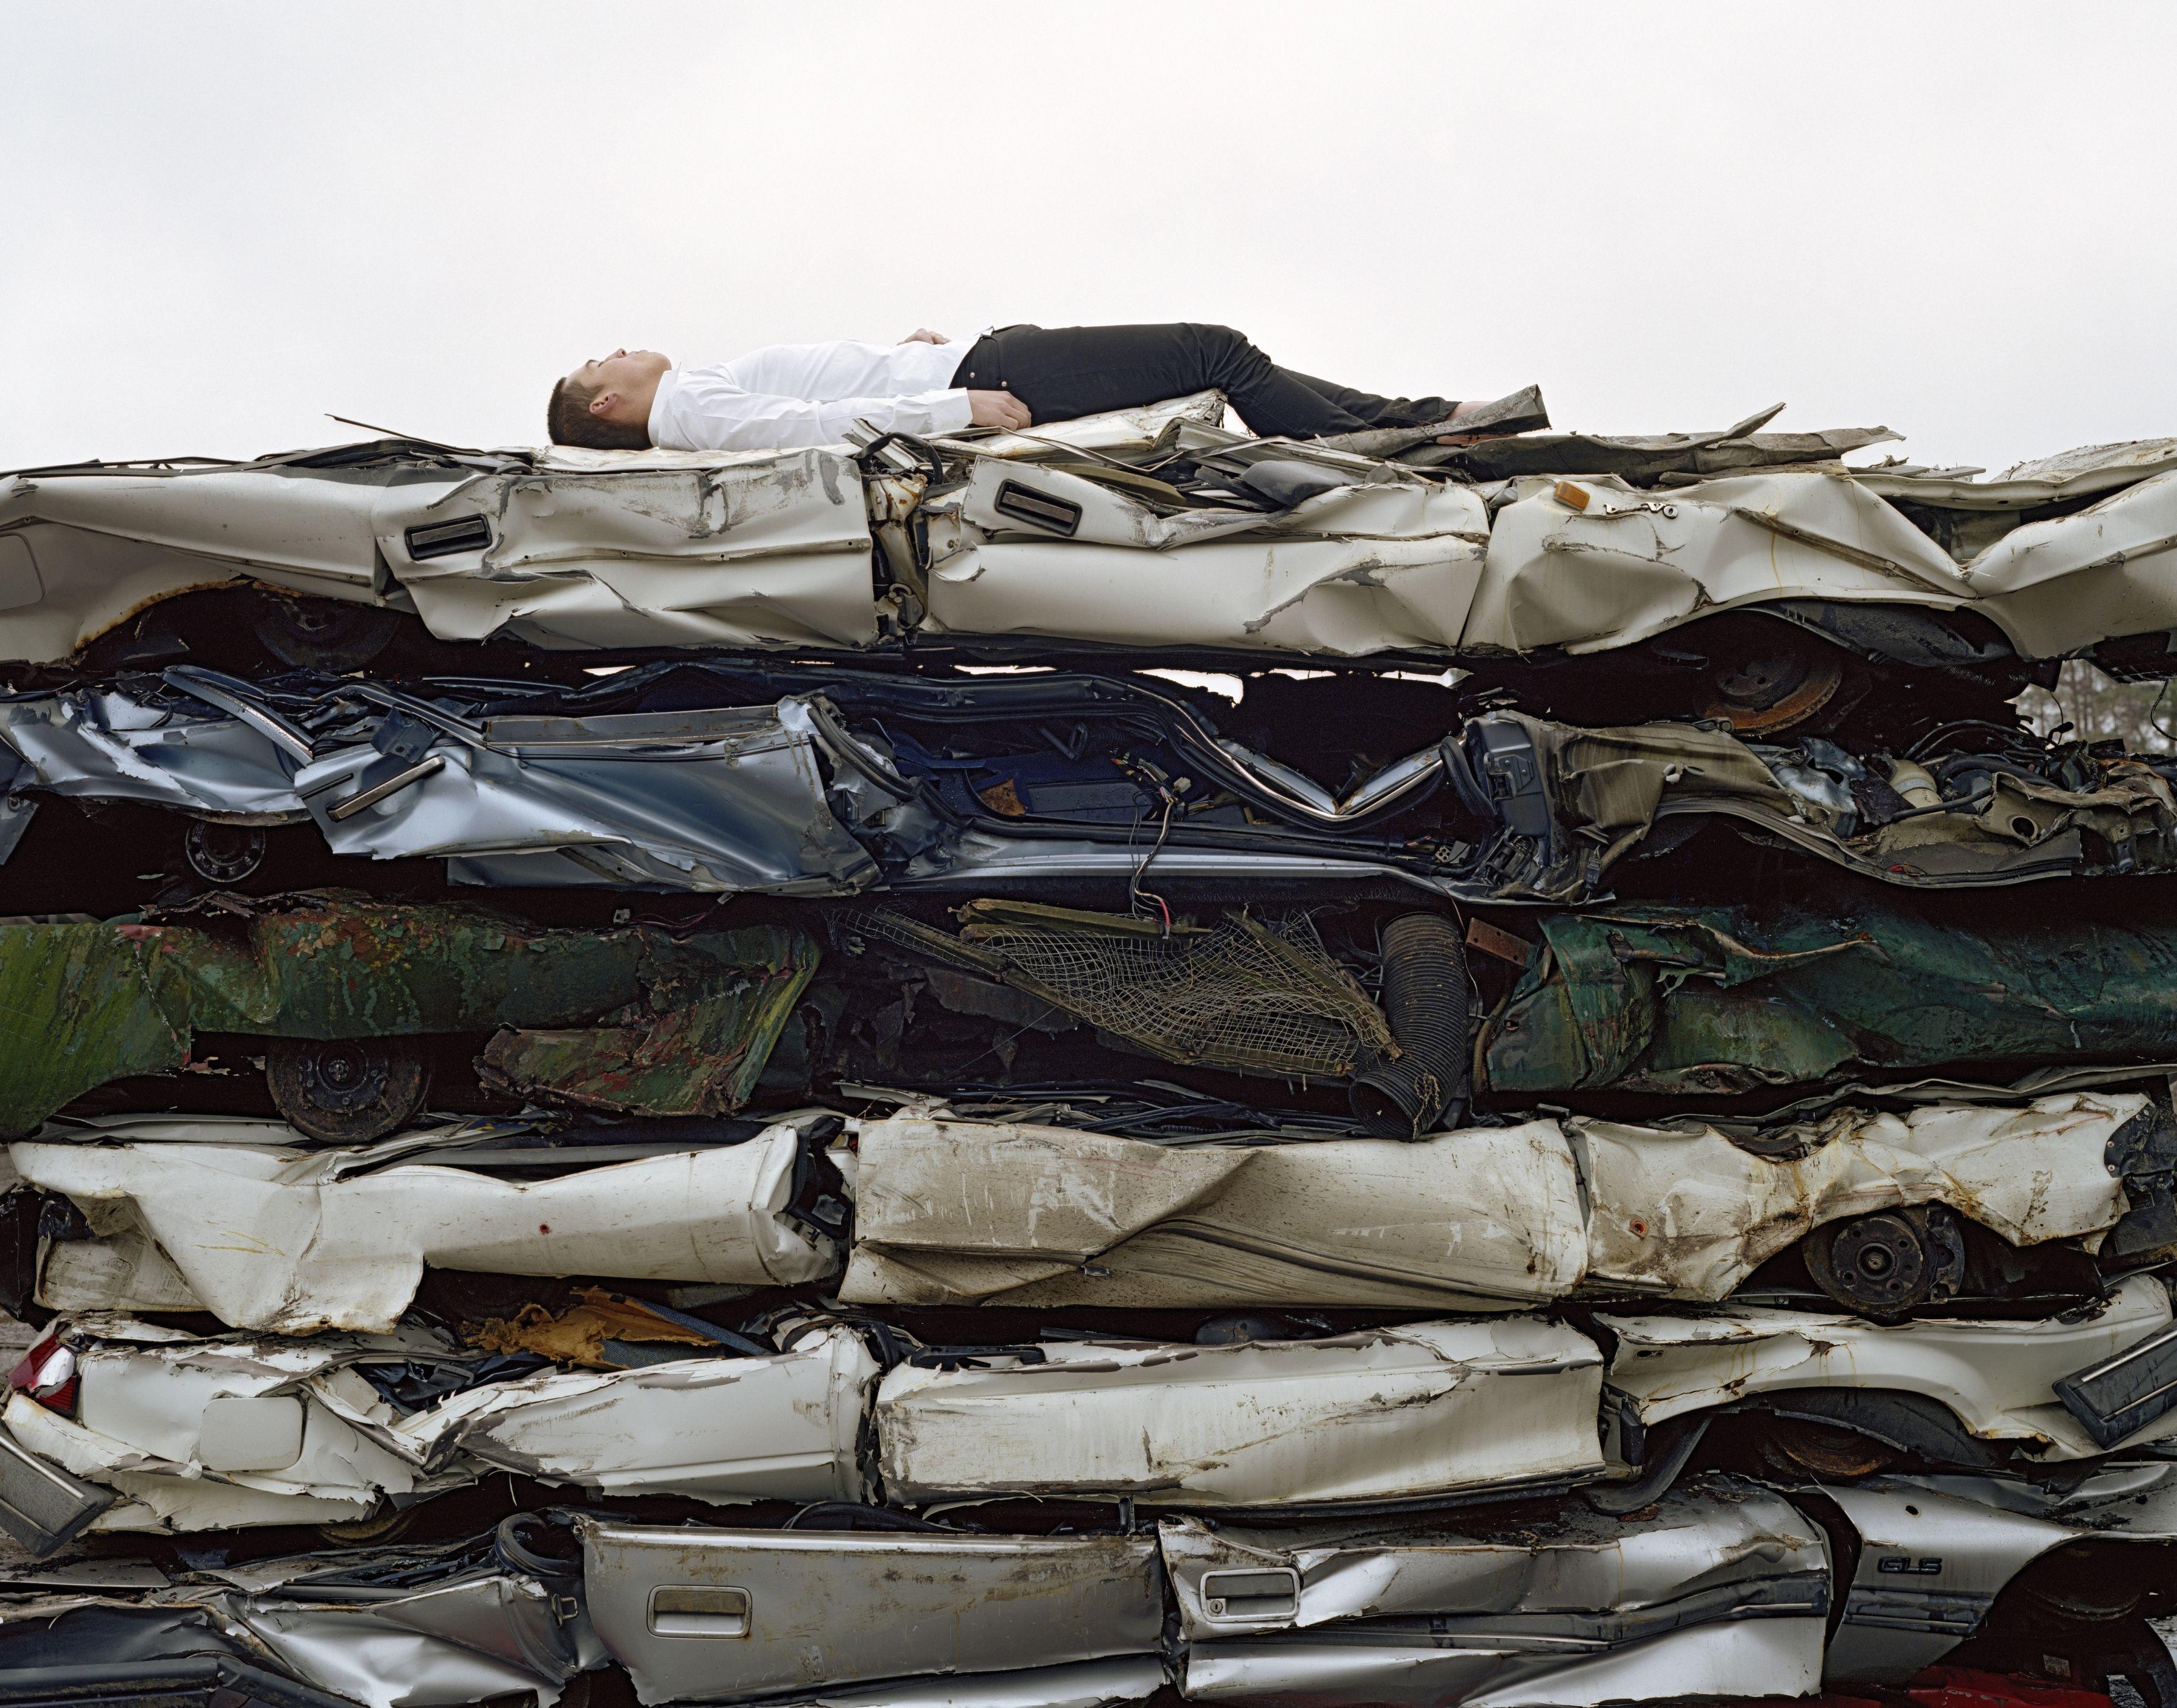 Maria Friberg  still lives #5  2005, Cibachrome, 71 x 91 inches